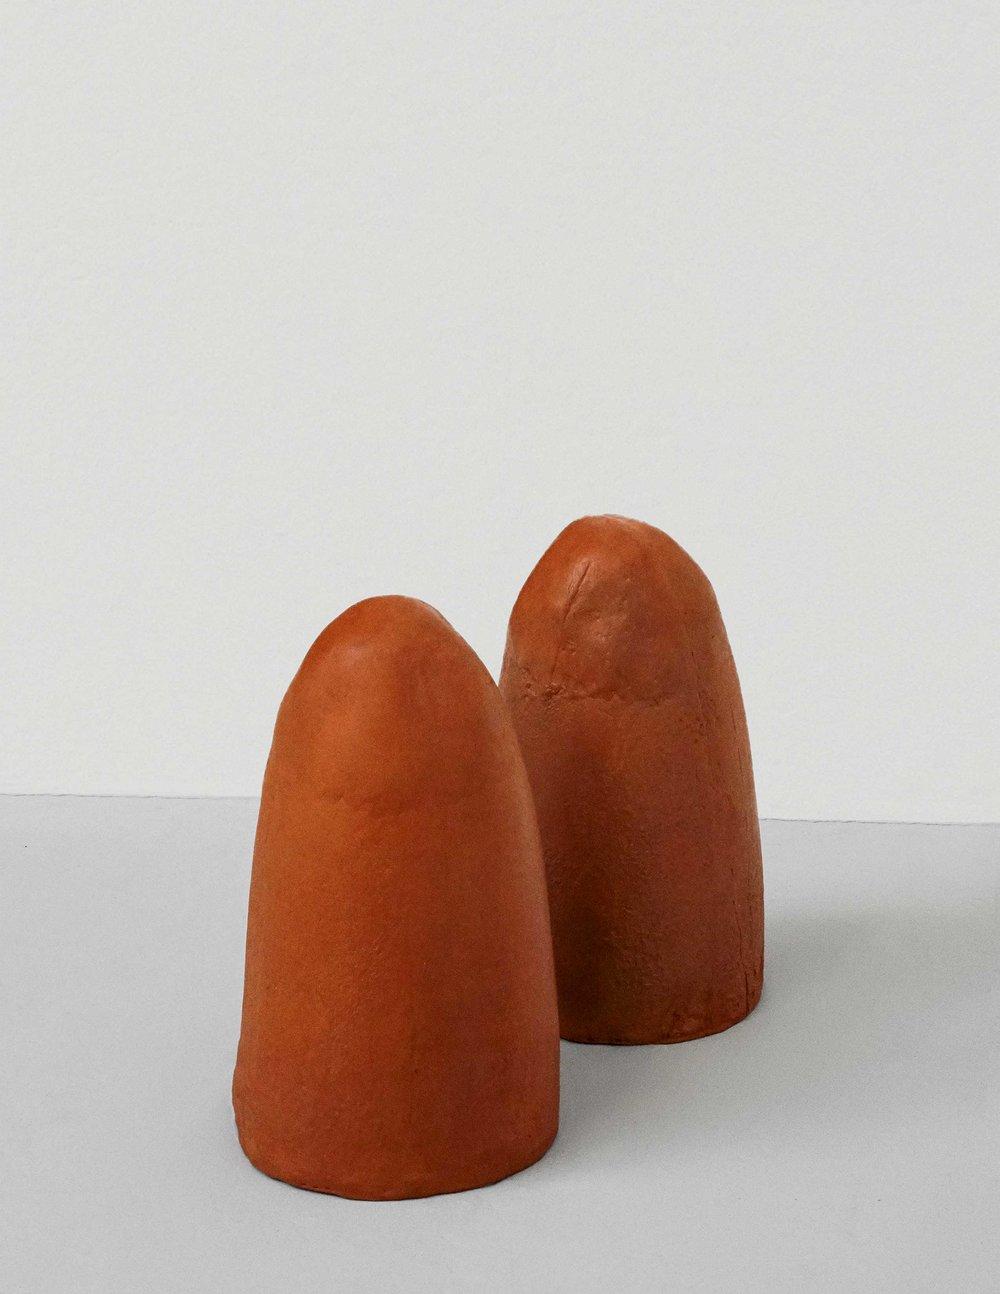 Terracotta Crucibles